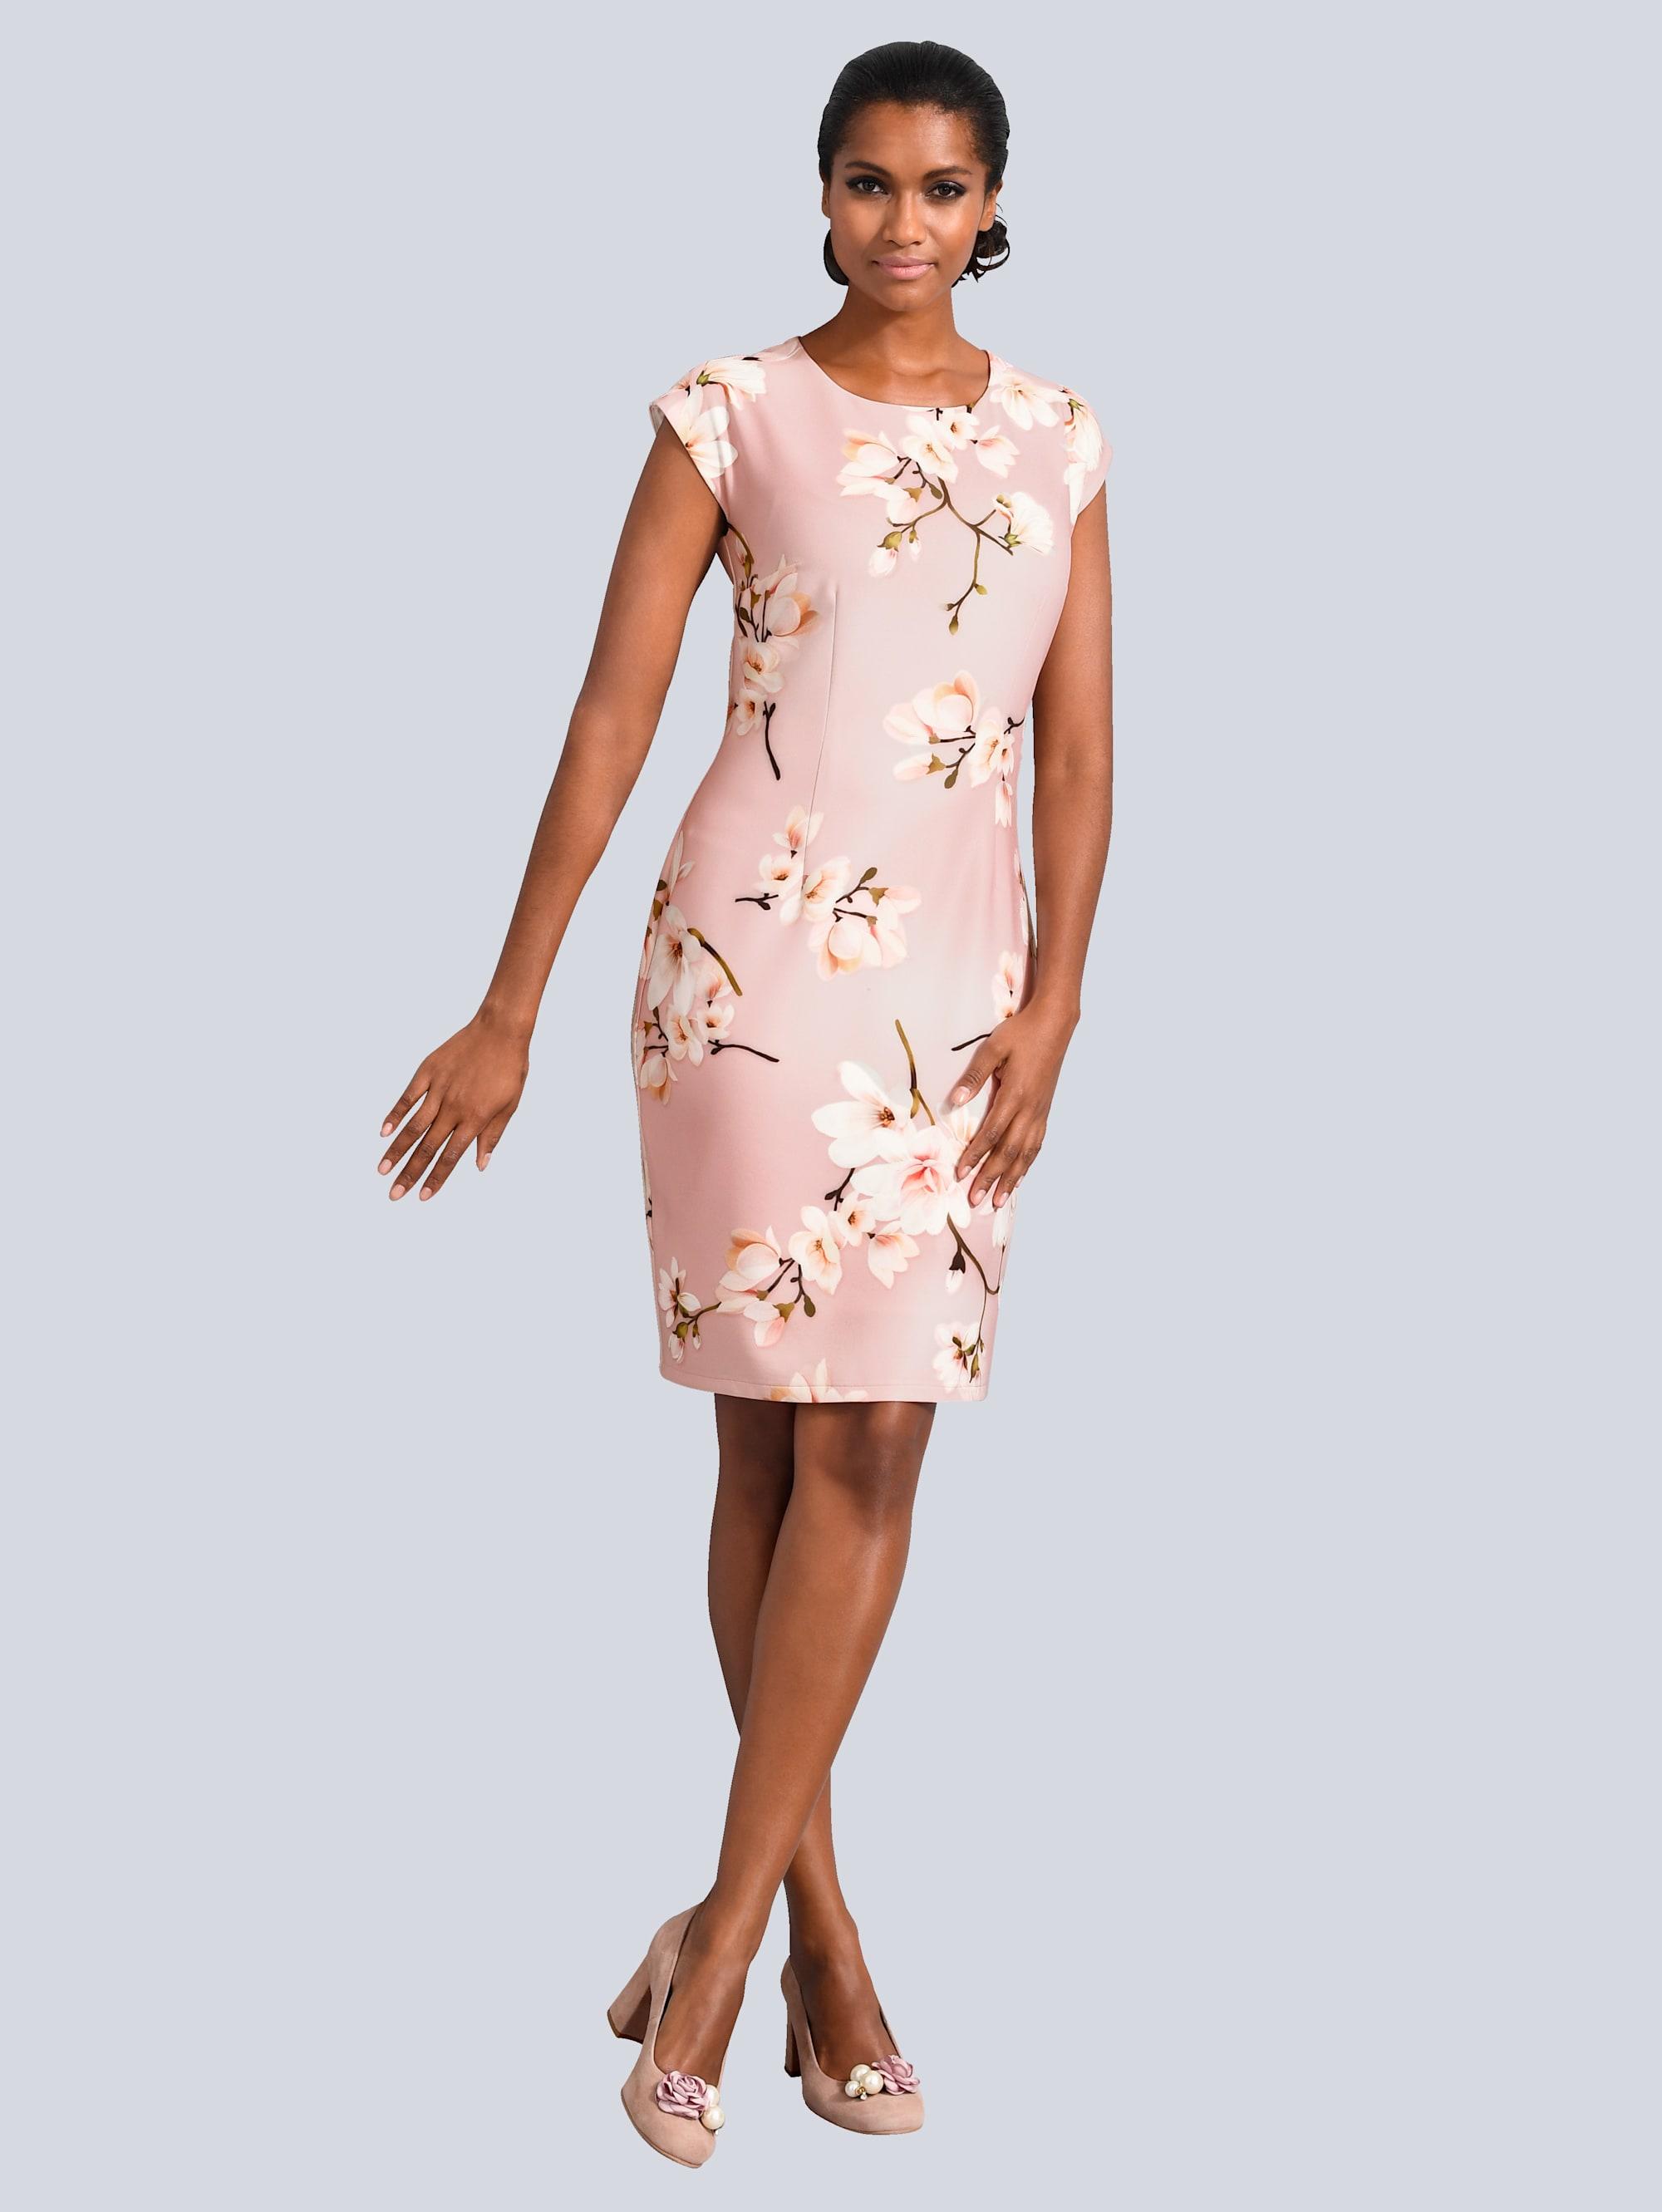 Alba Moda Kleid allover im floralen Dessin Xzoyv M1yRd